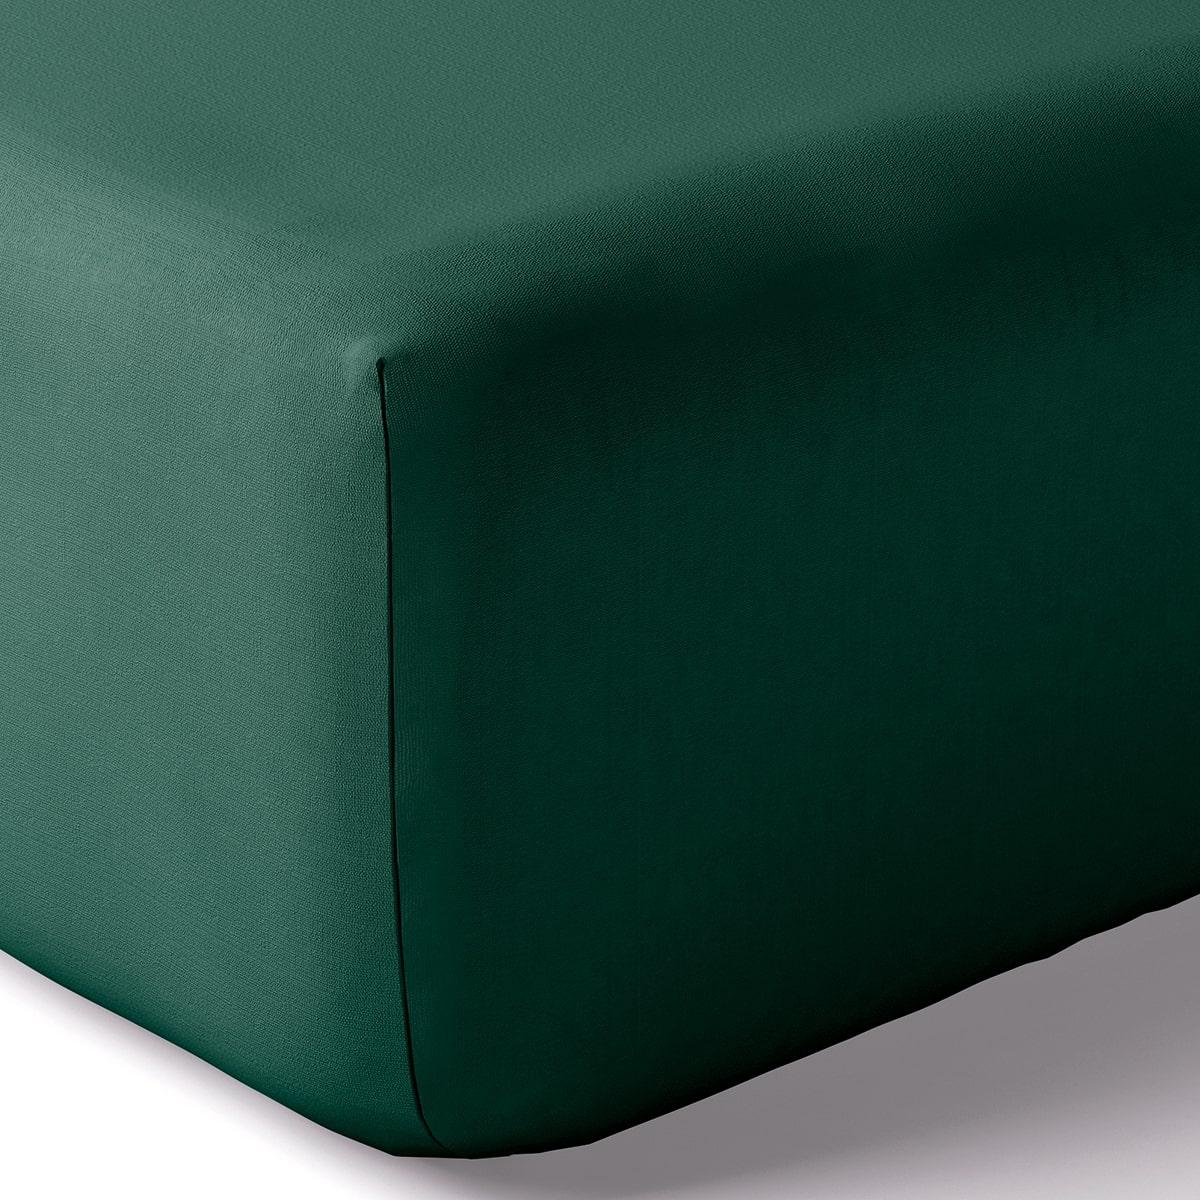 Drap housse coton 140x200 cm emeraude